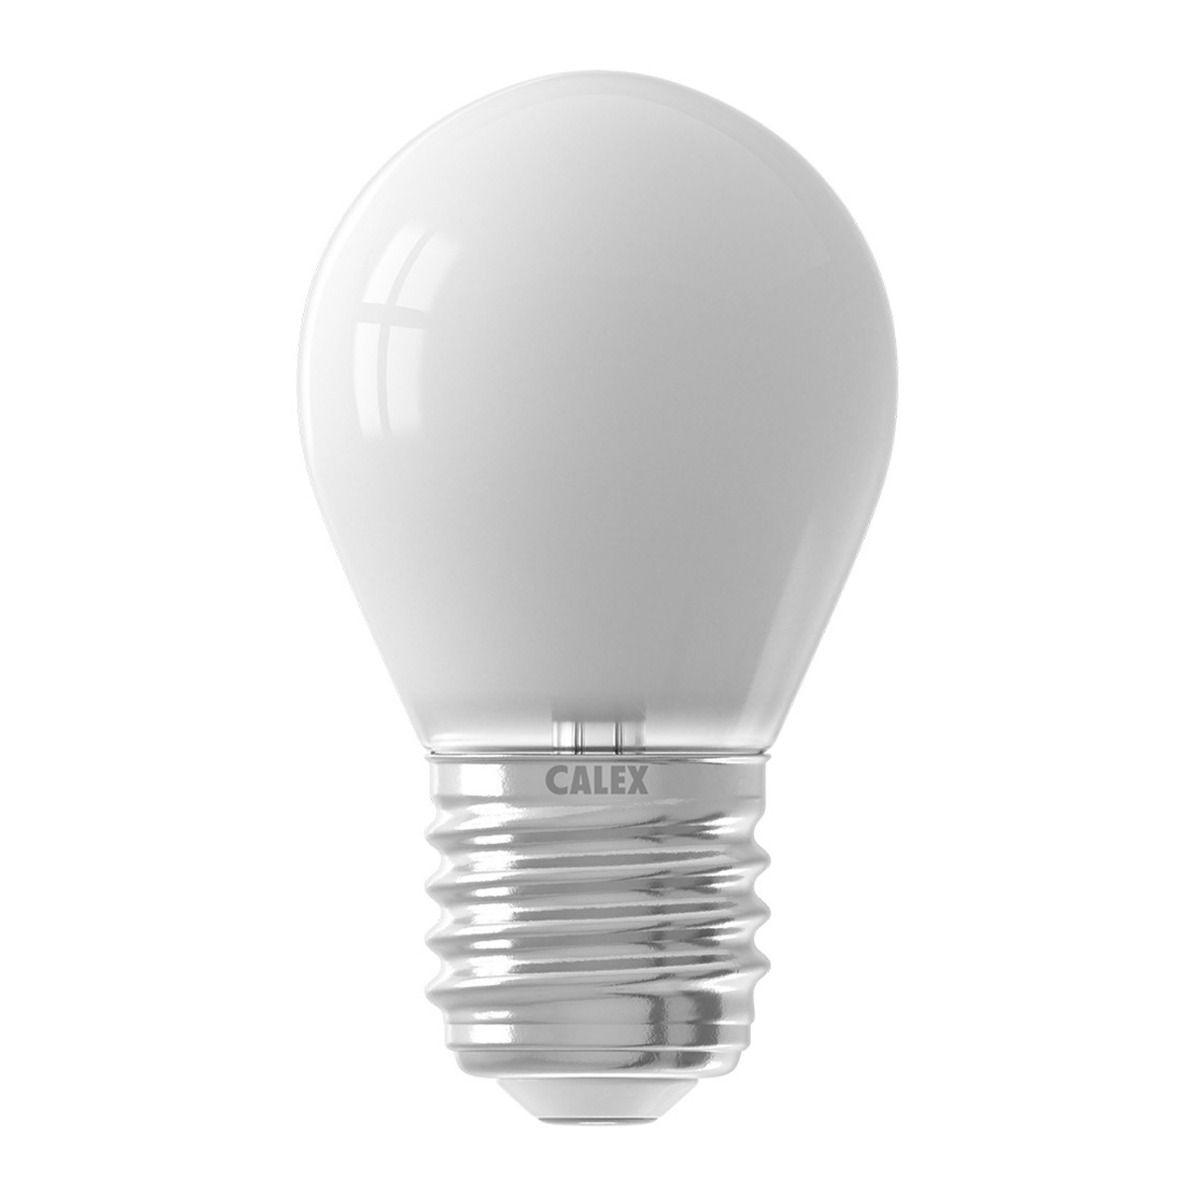 Calex Smart Kogelvormig LED Lamp E27 4,5W 400lm 2200-4000K | Tuya Wifi - Afstembaar Wit